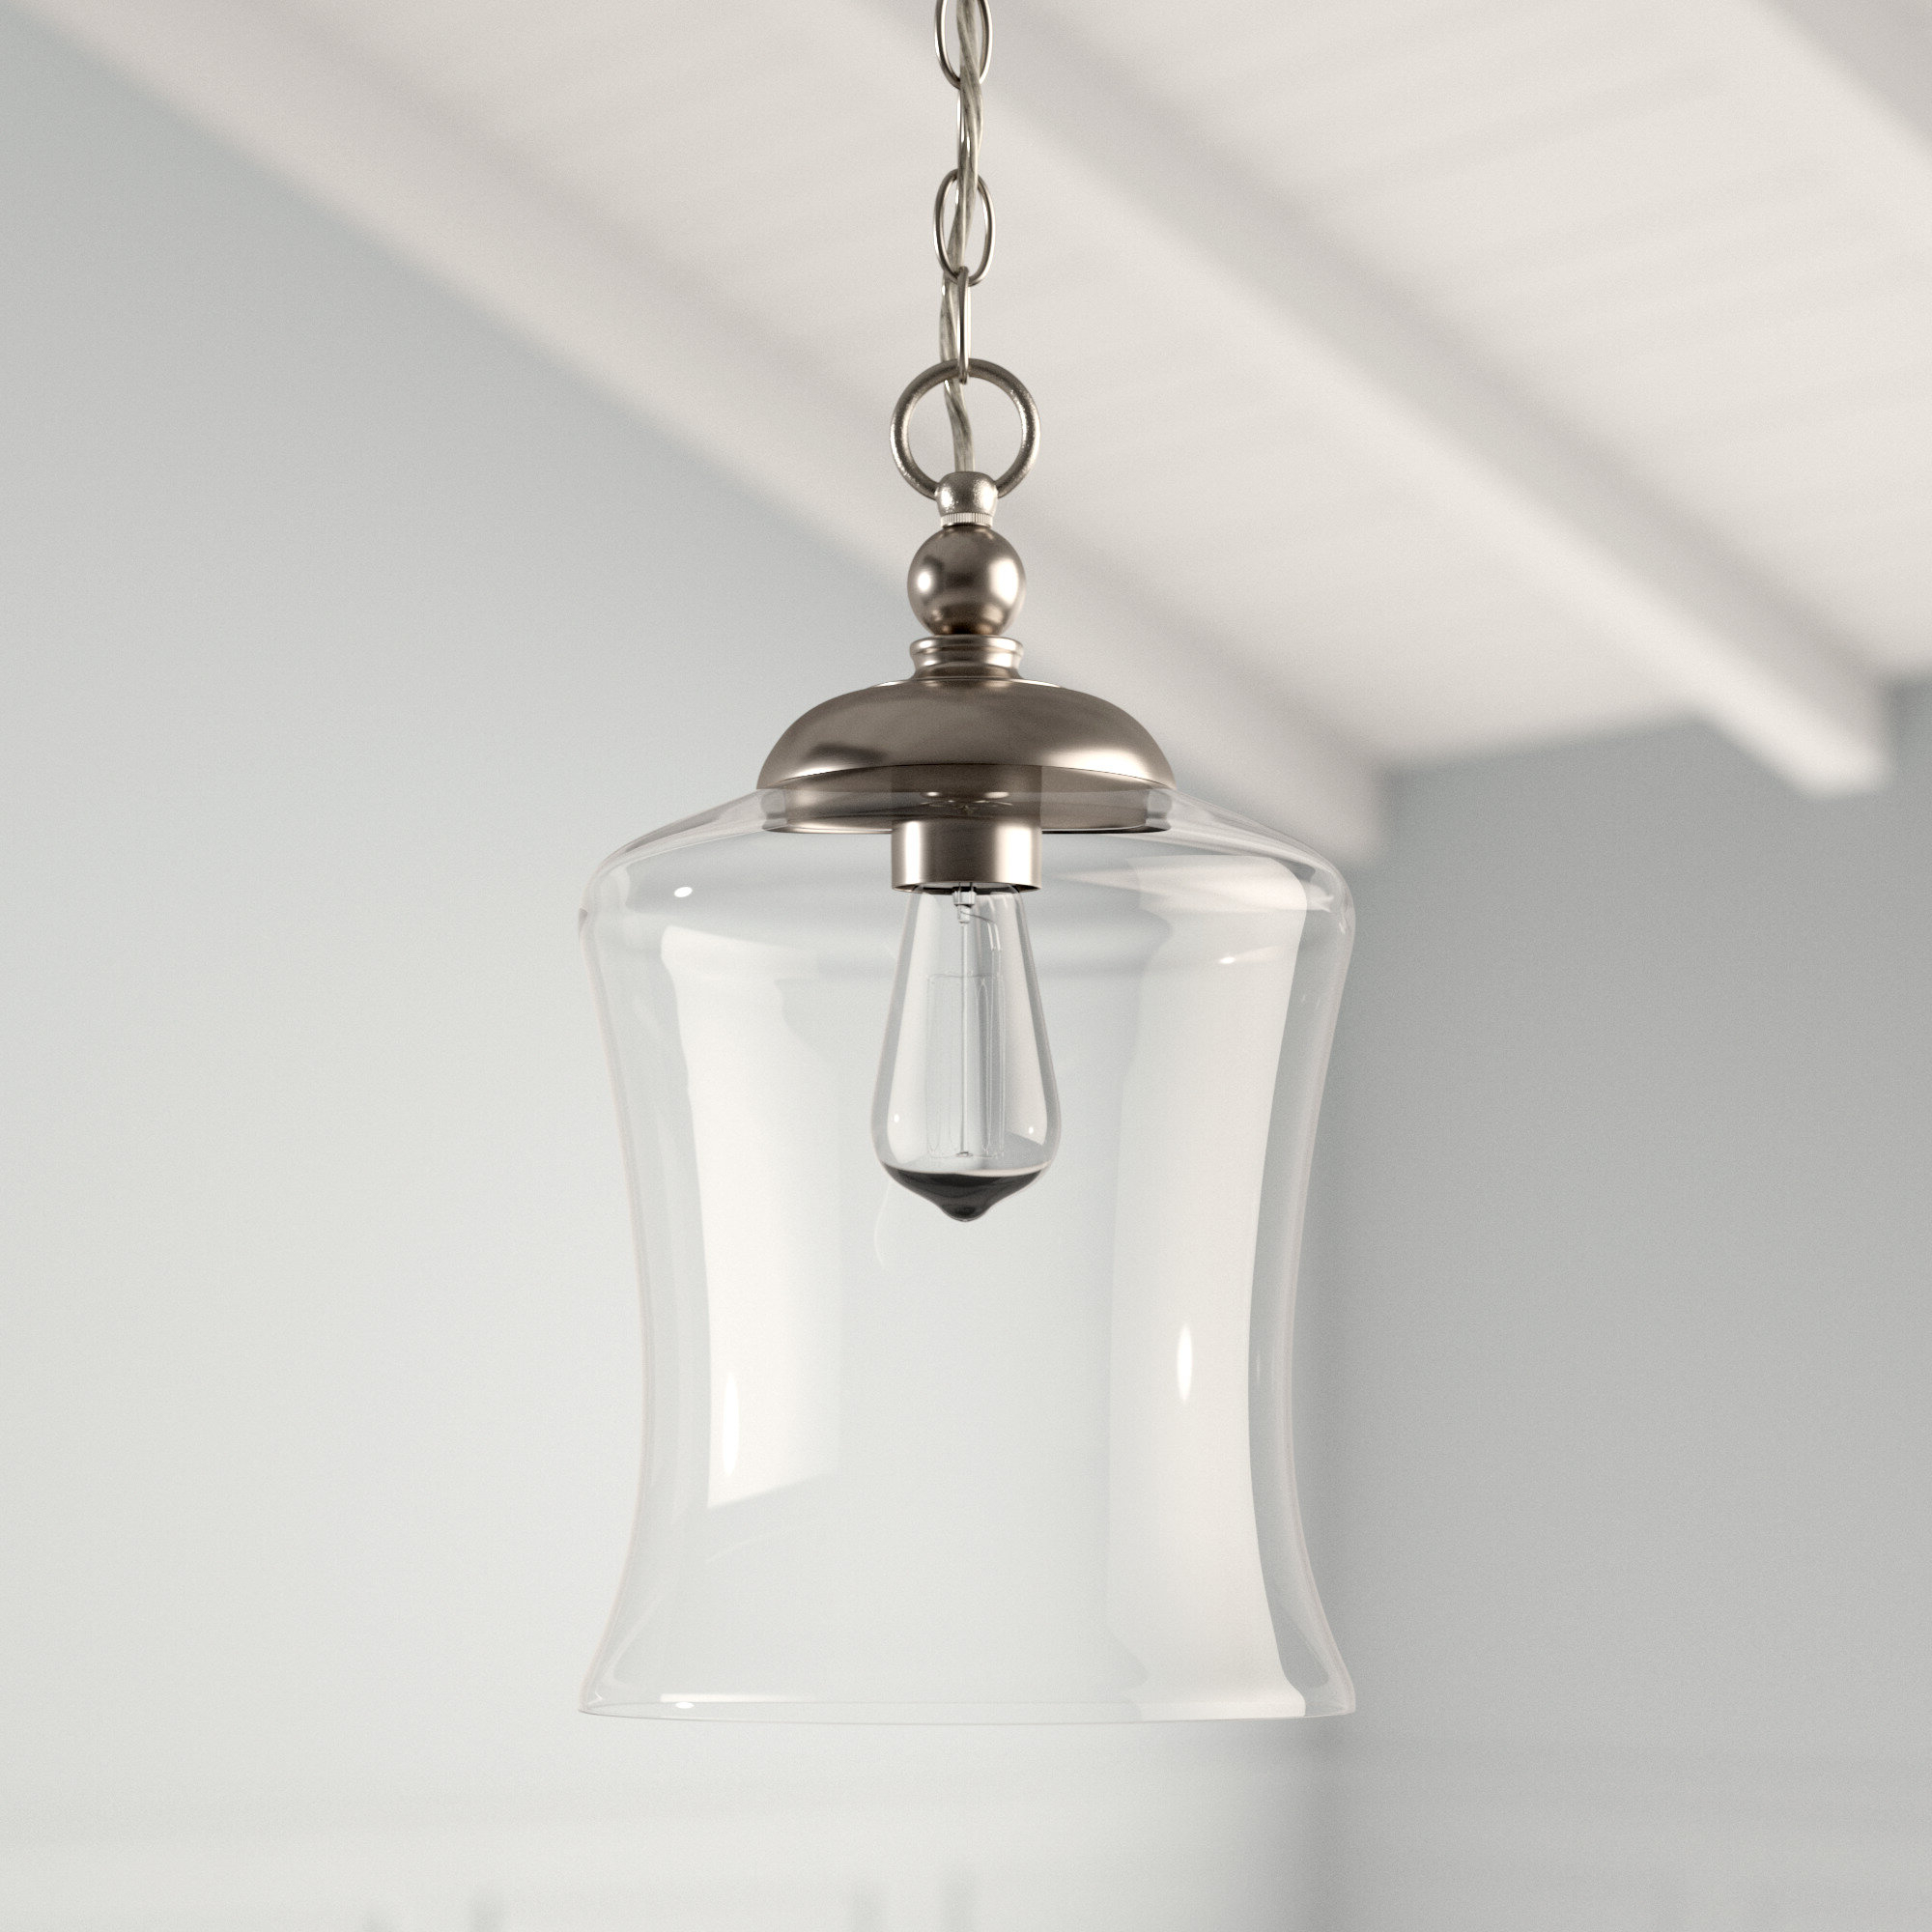 Popular Wentzville 1 Light Single Bell Pendant Inside Carey 1 Light Single Bell Pendants (View 21 of 25)